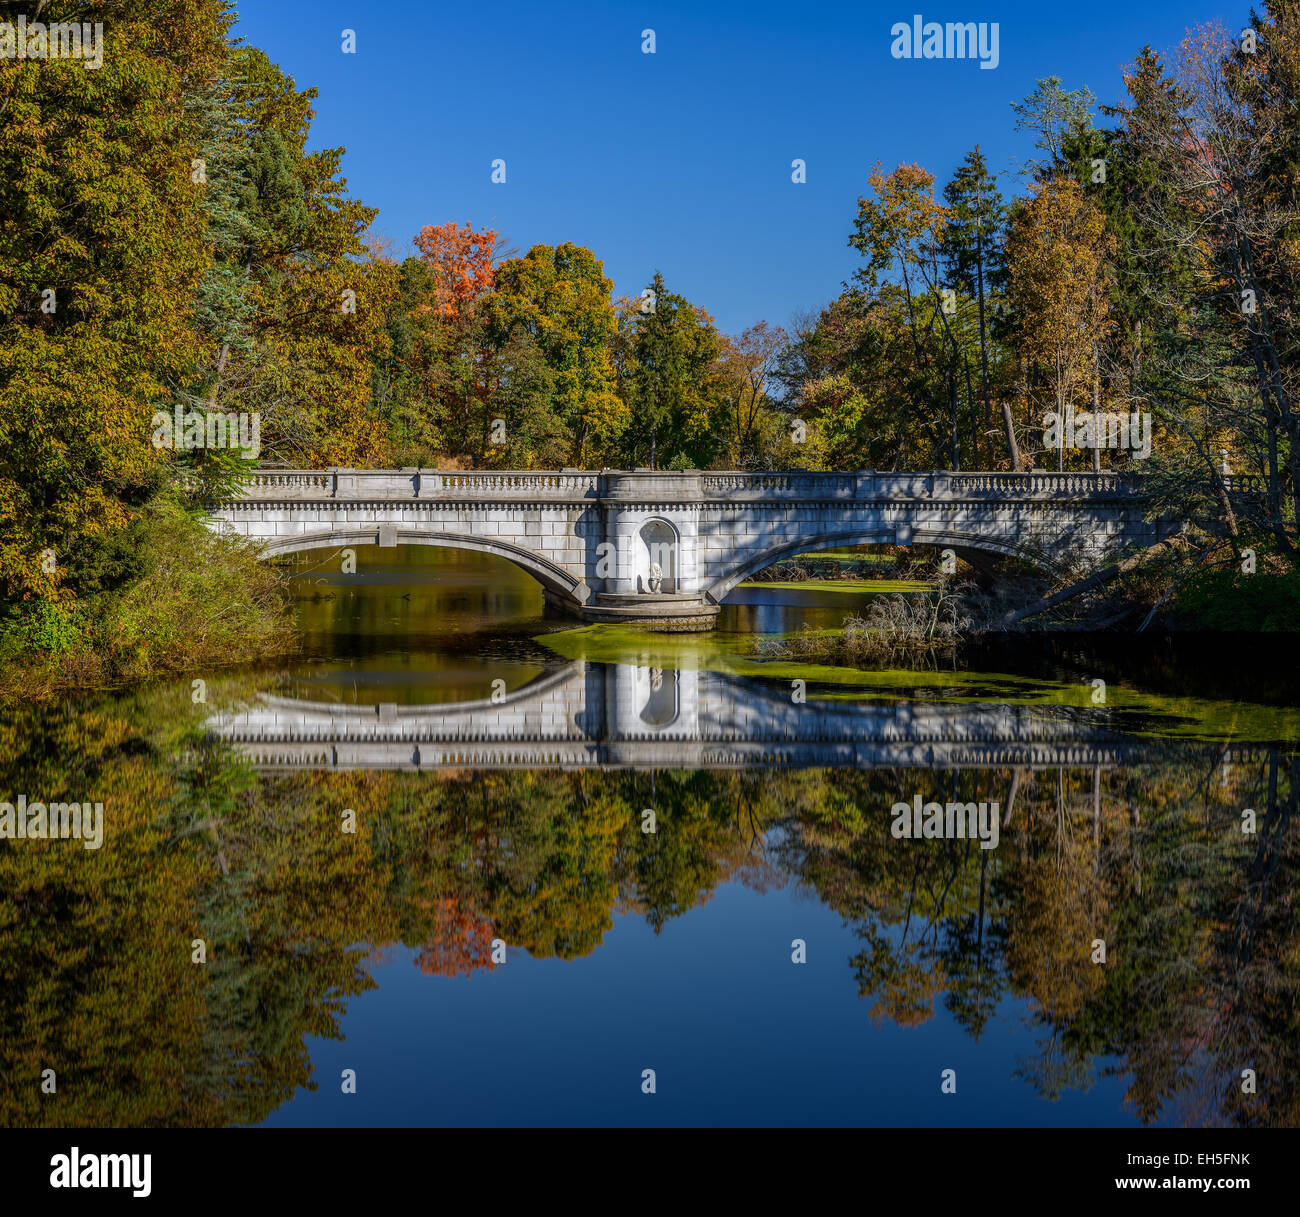 Romantic old stone bridge over a river in autumn scenery - Stock Image